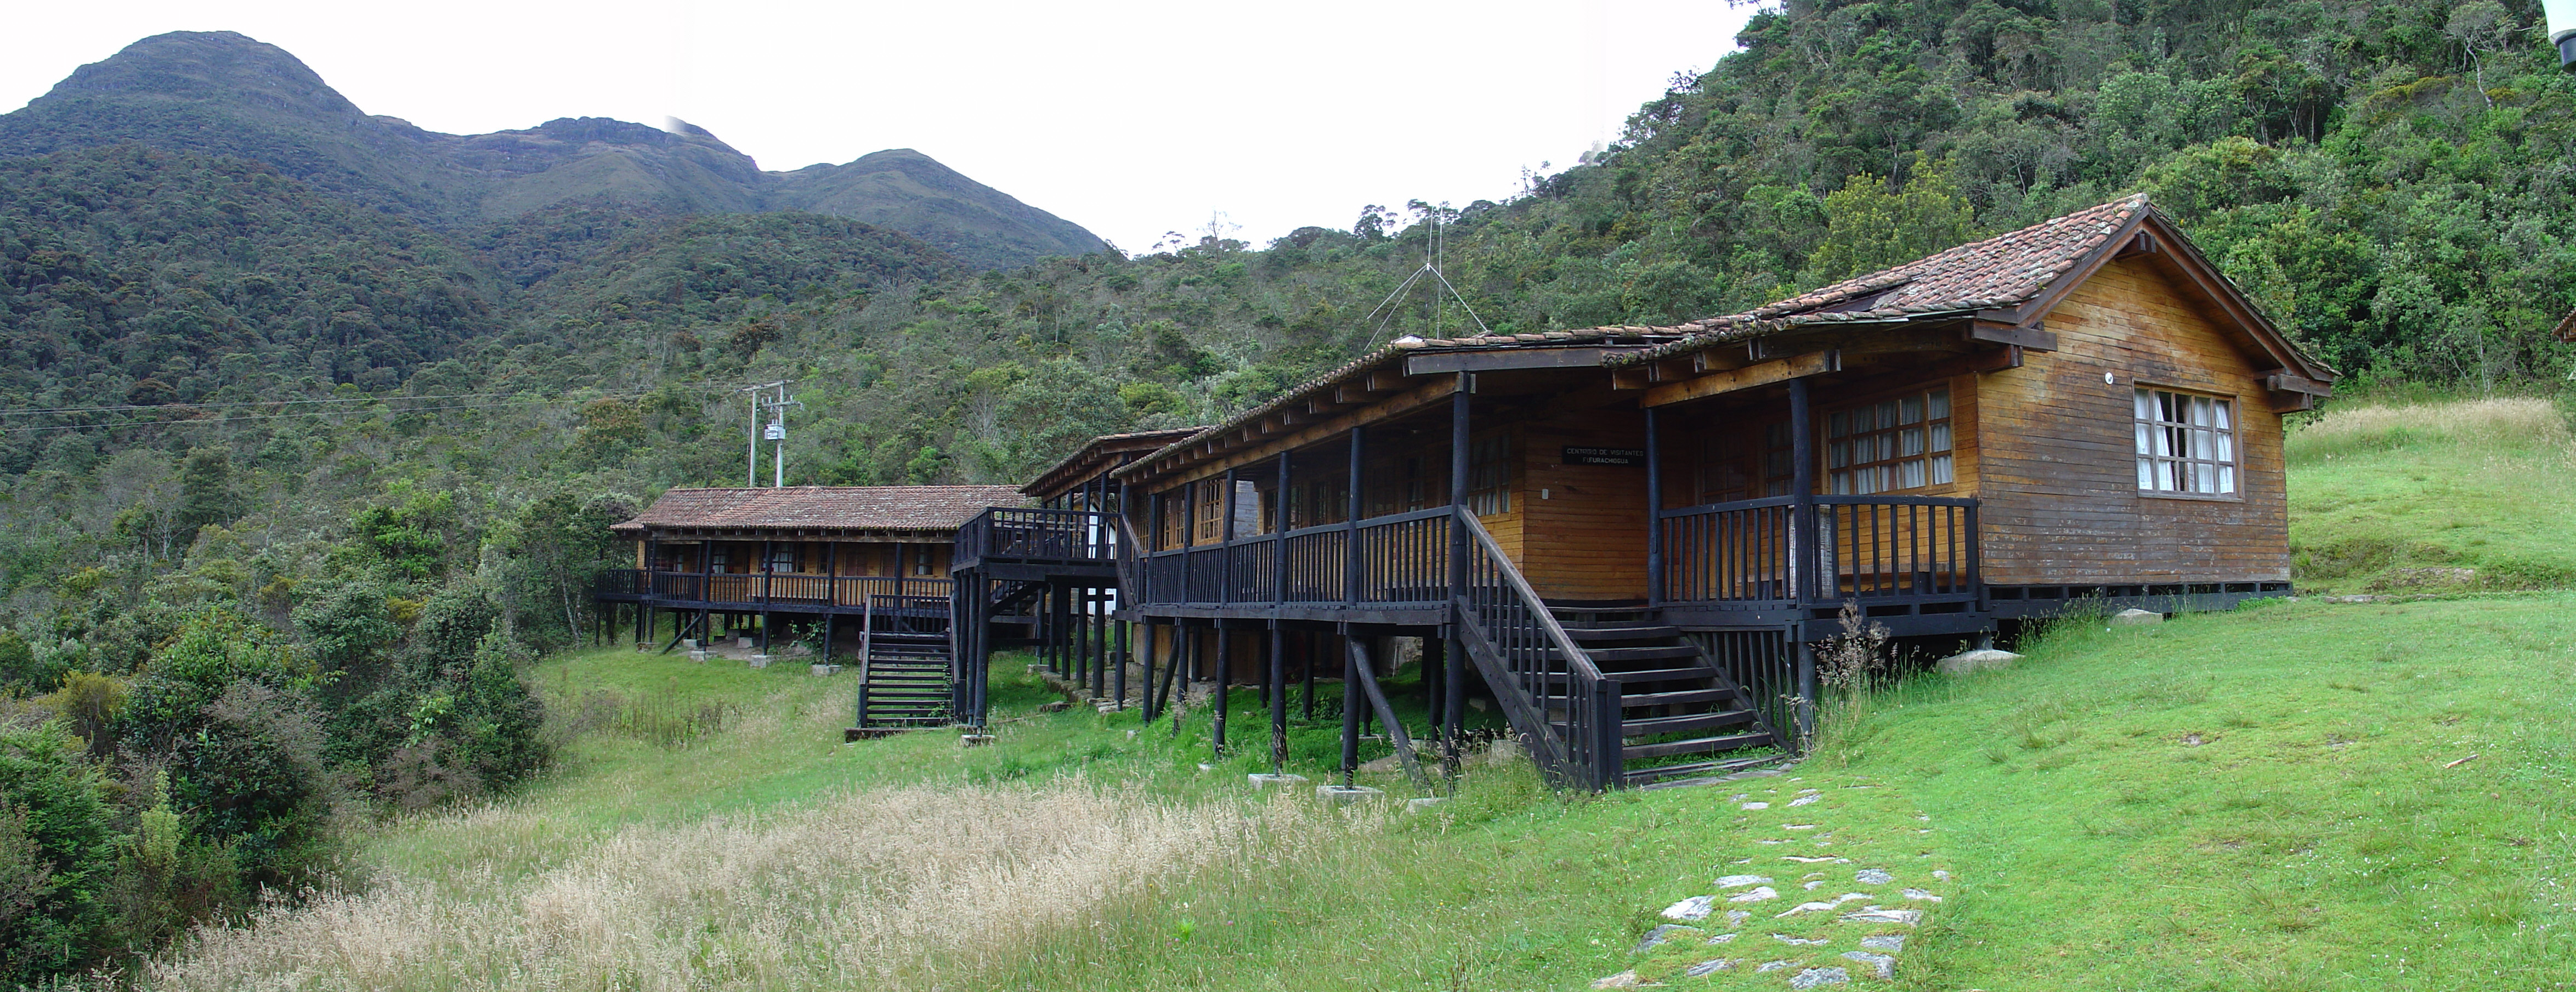 Naturar Iguaque Lodge